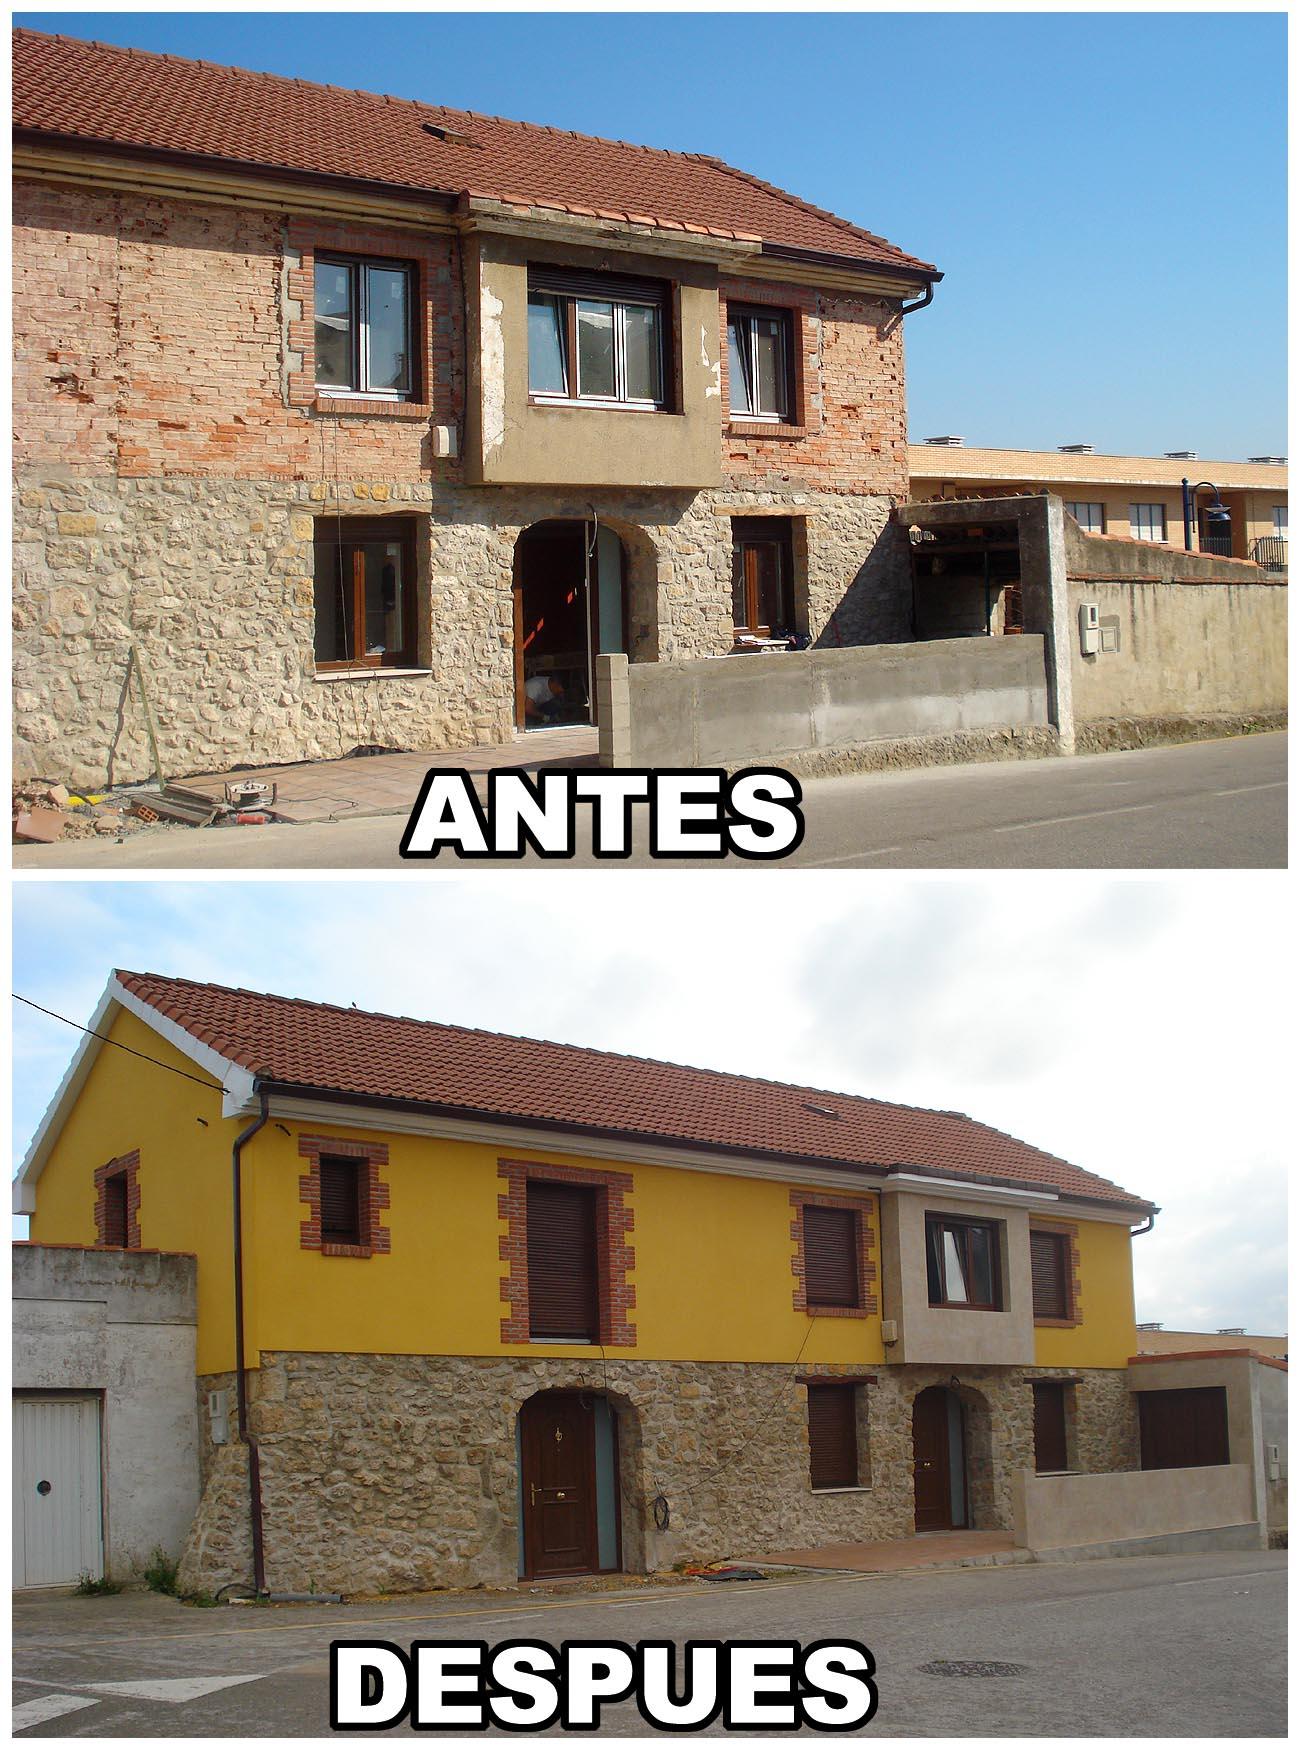 Rehabilitaci n casas de piedra en cantabria empresas rehablitacion casas de piedra cantabria - Rehabilitacion de casas ...